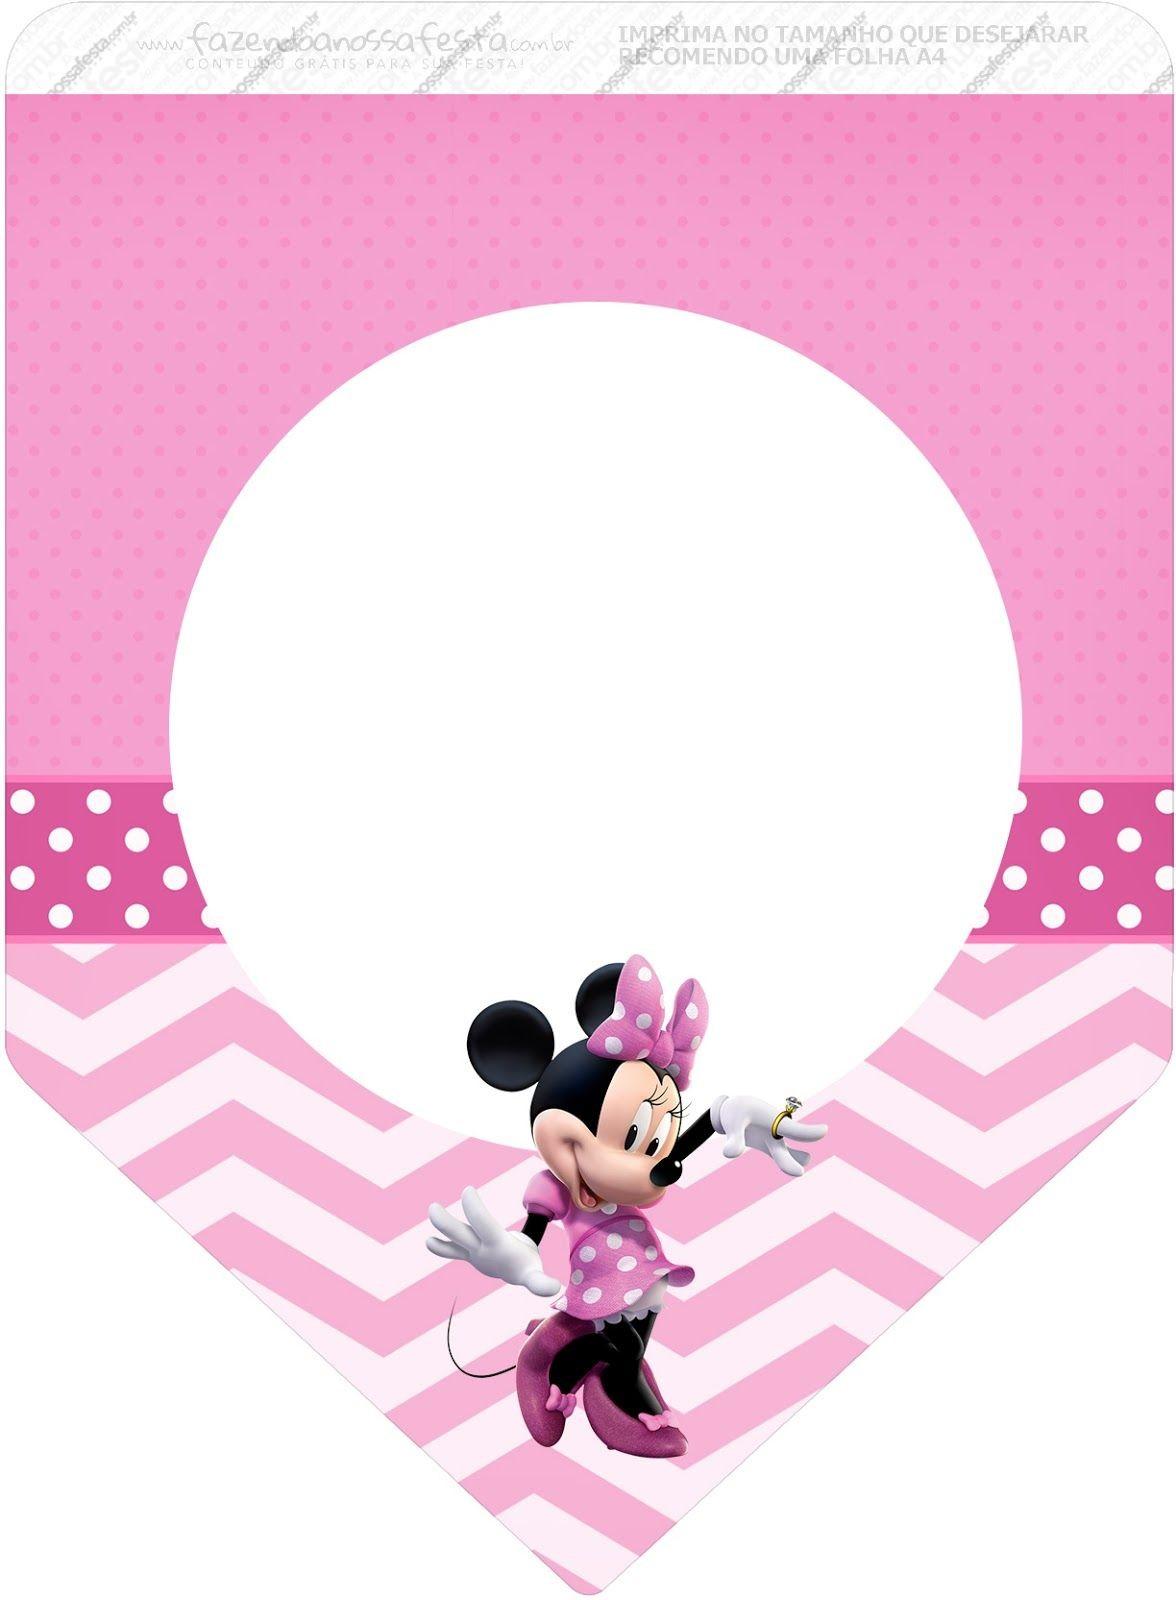 Minnie Mouse Papercraft Coqueta Minnie En Rosa Imprimibles Gratis Para Fiestas